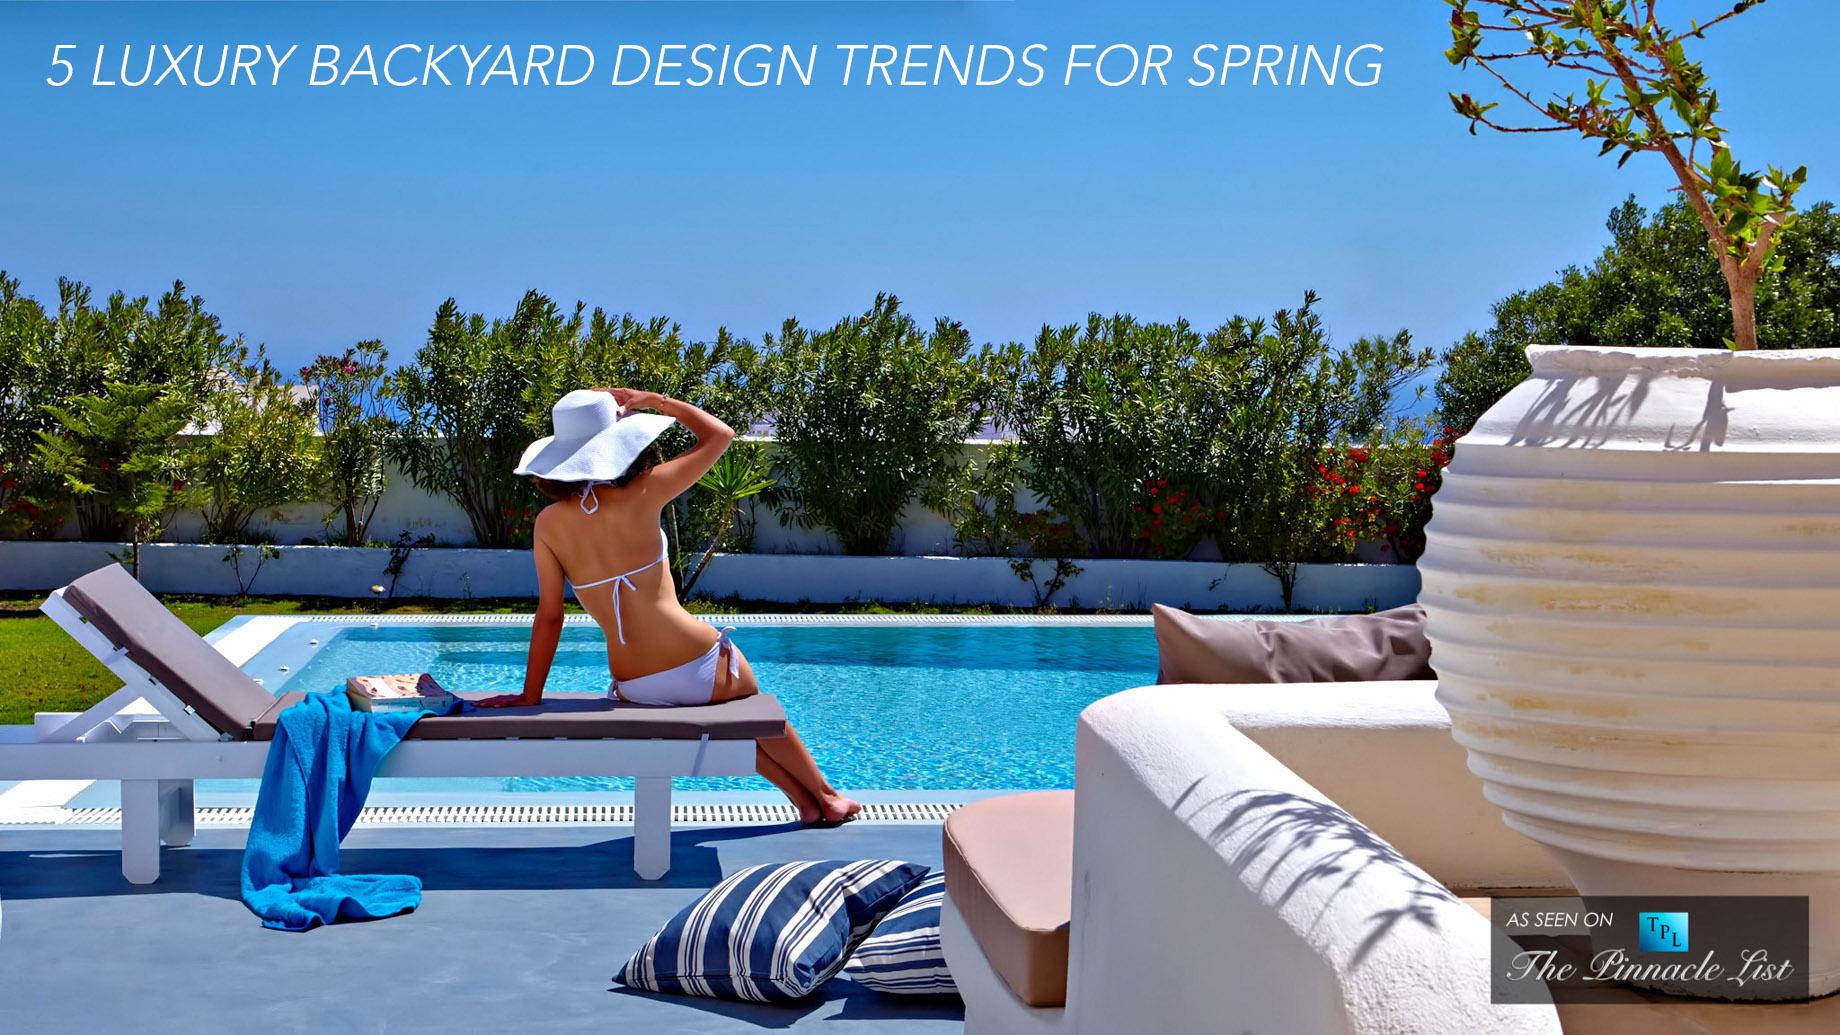 5 Luxury Backyard Design Trends for Spring